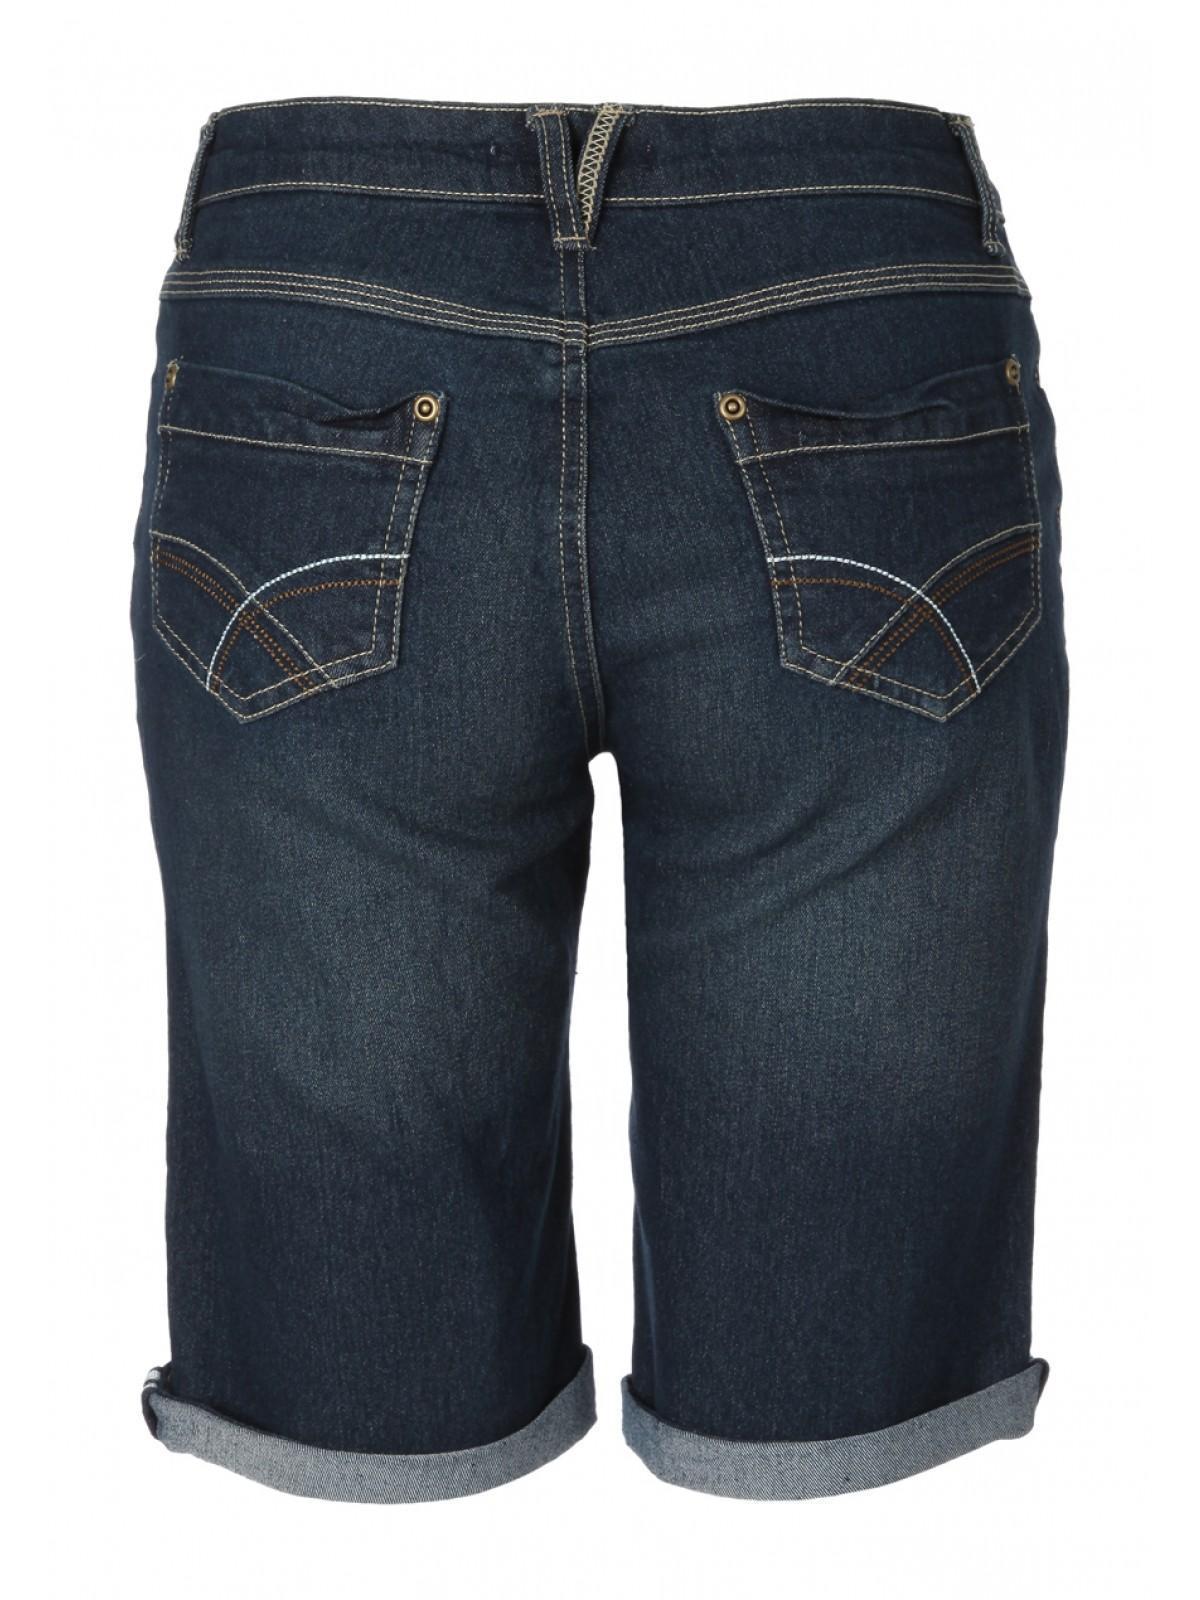 Long Denim Shorts For Women